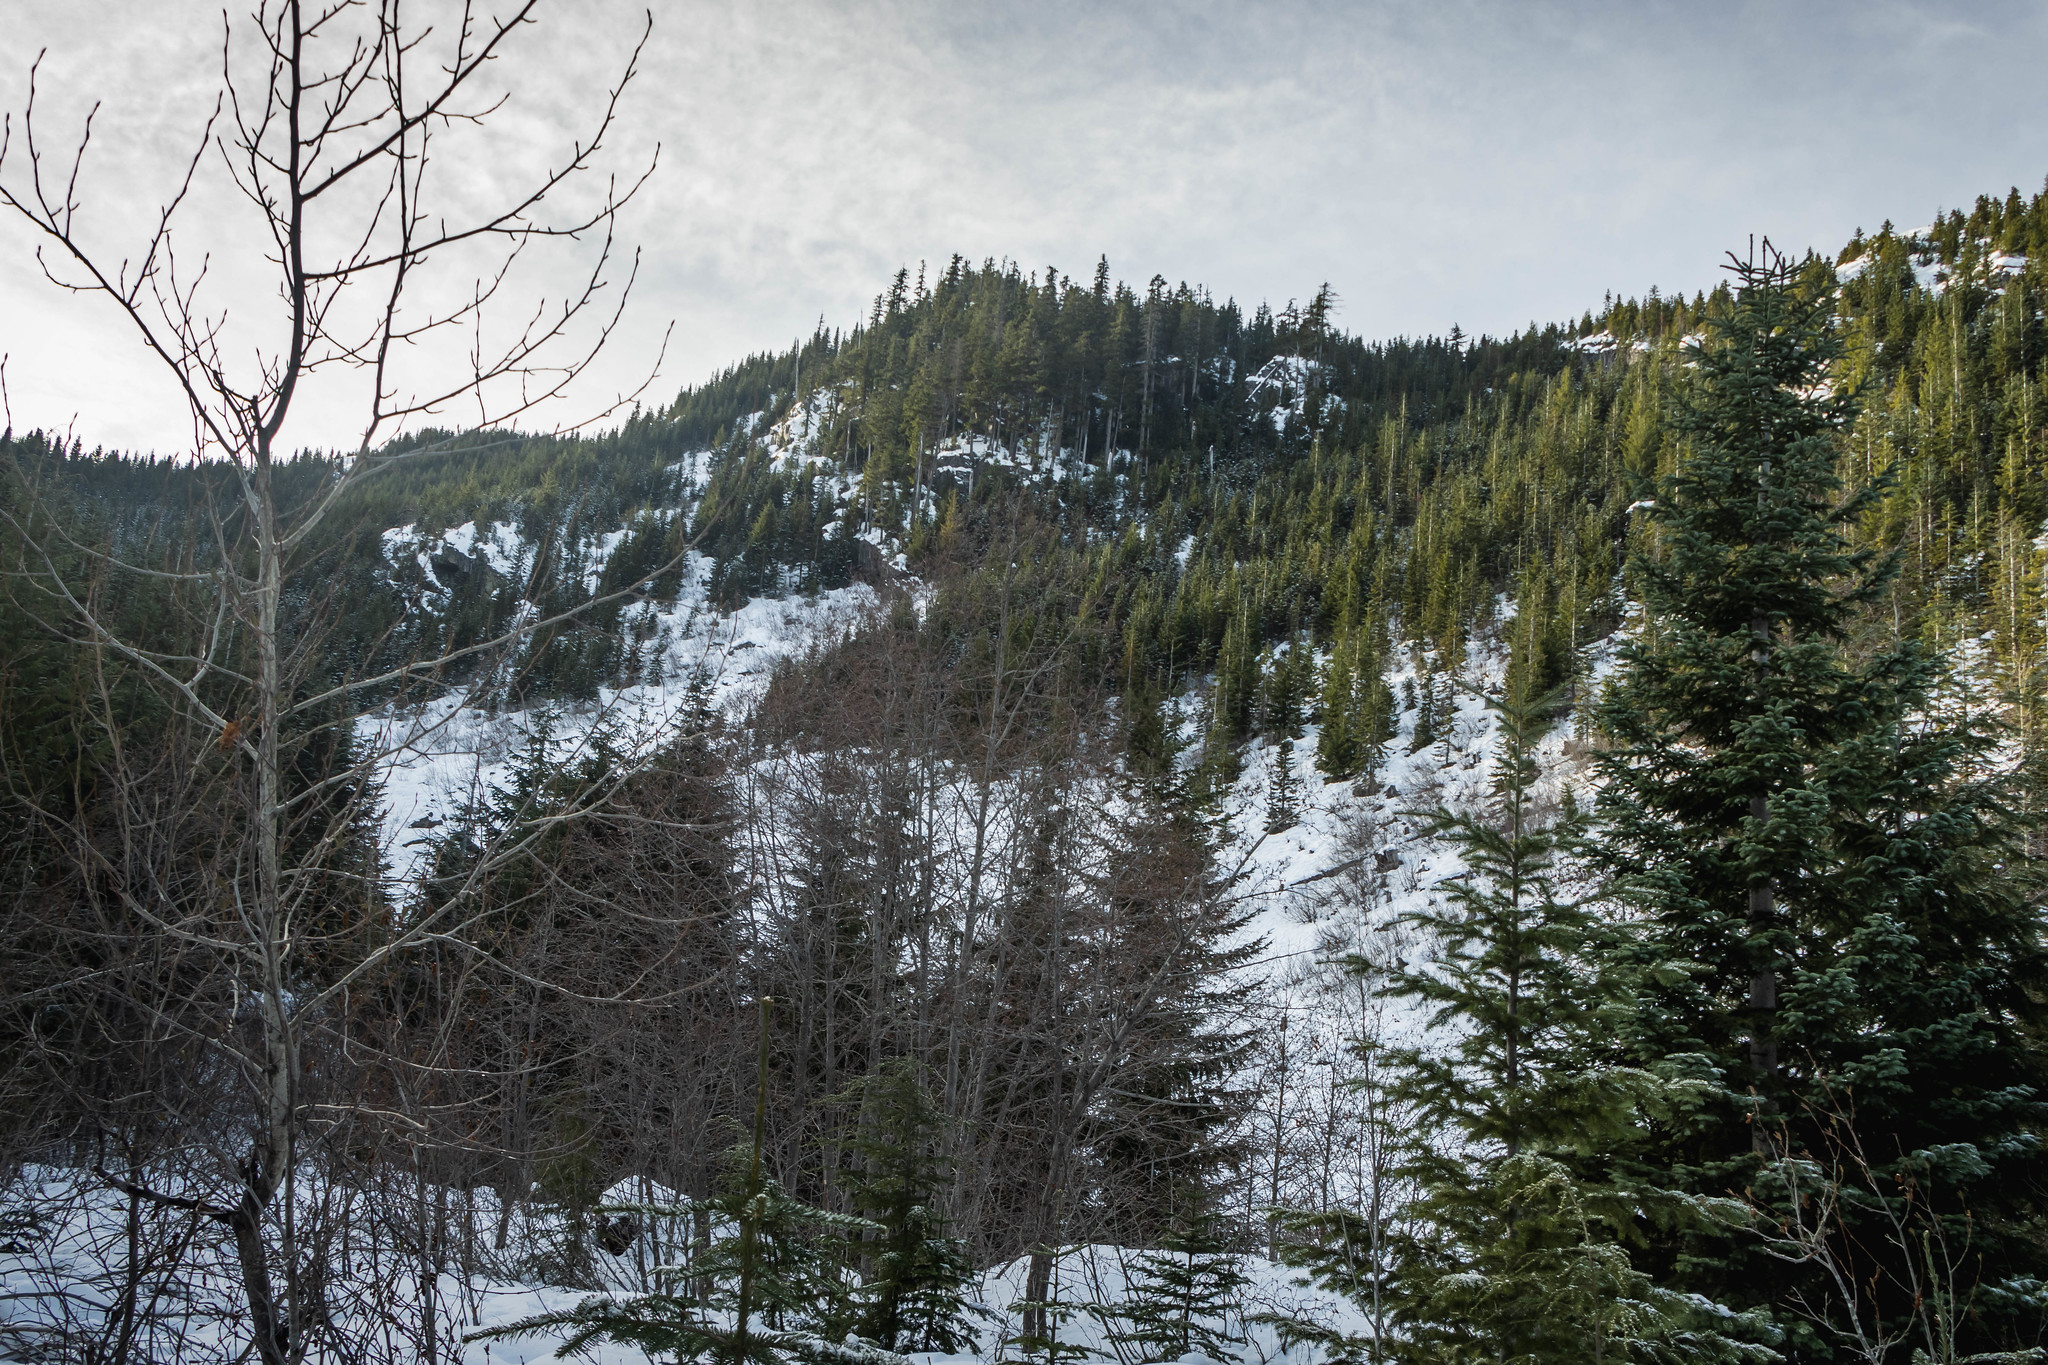 Greenway Mountain's farewell